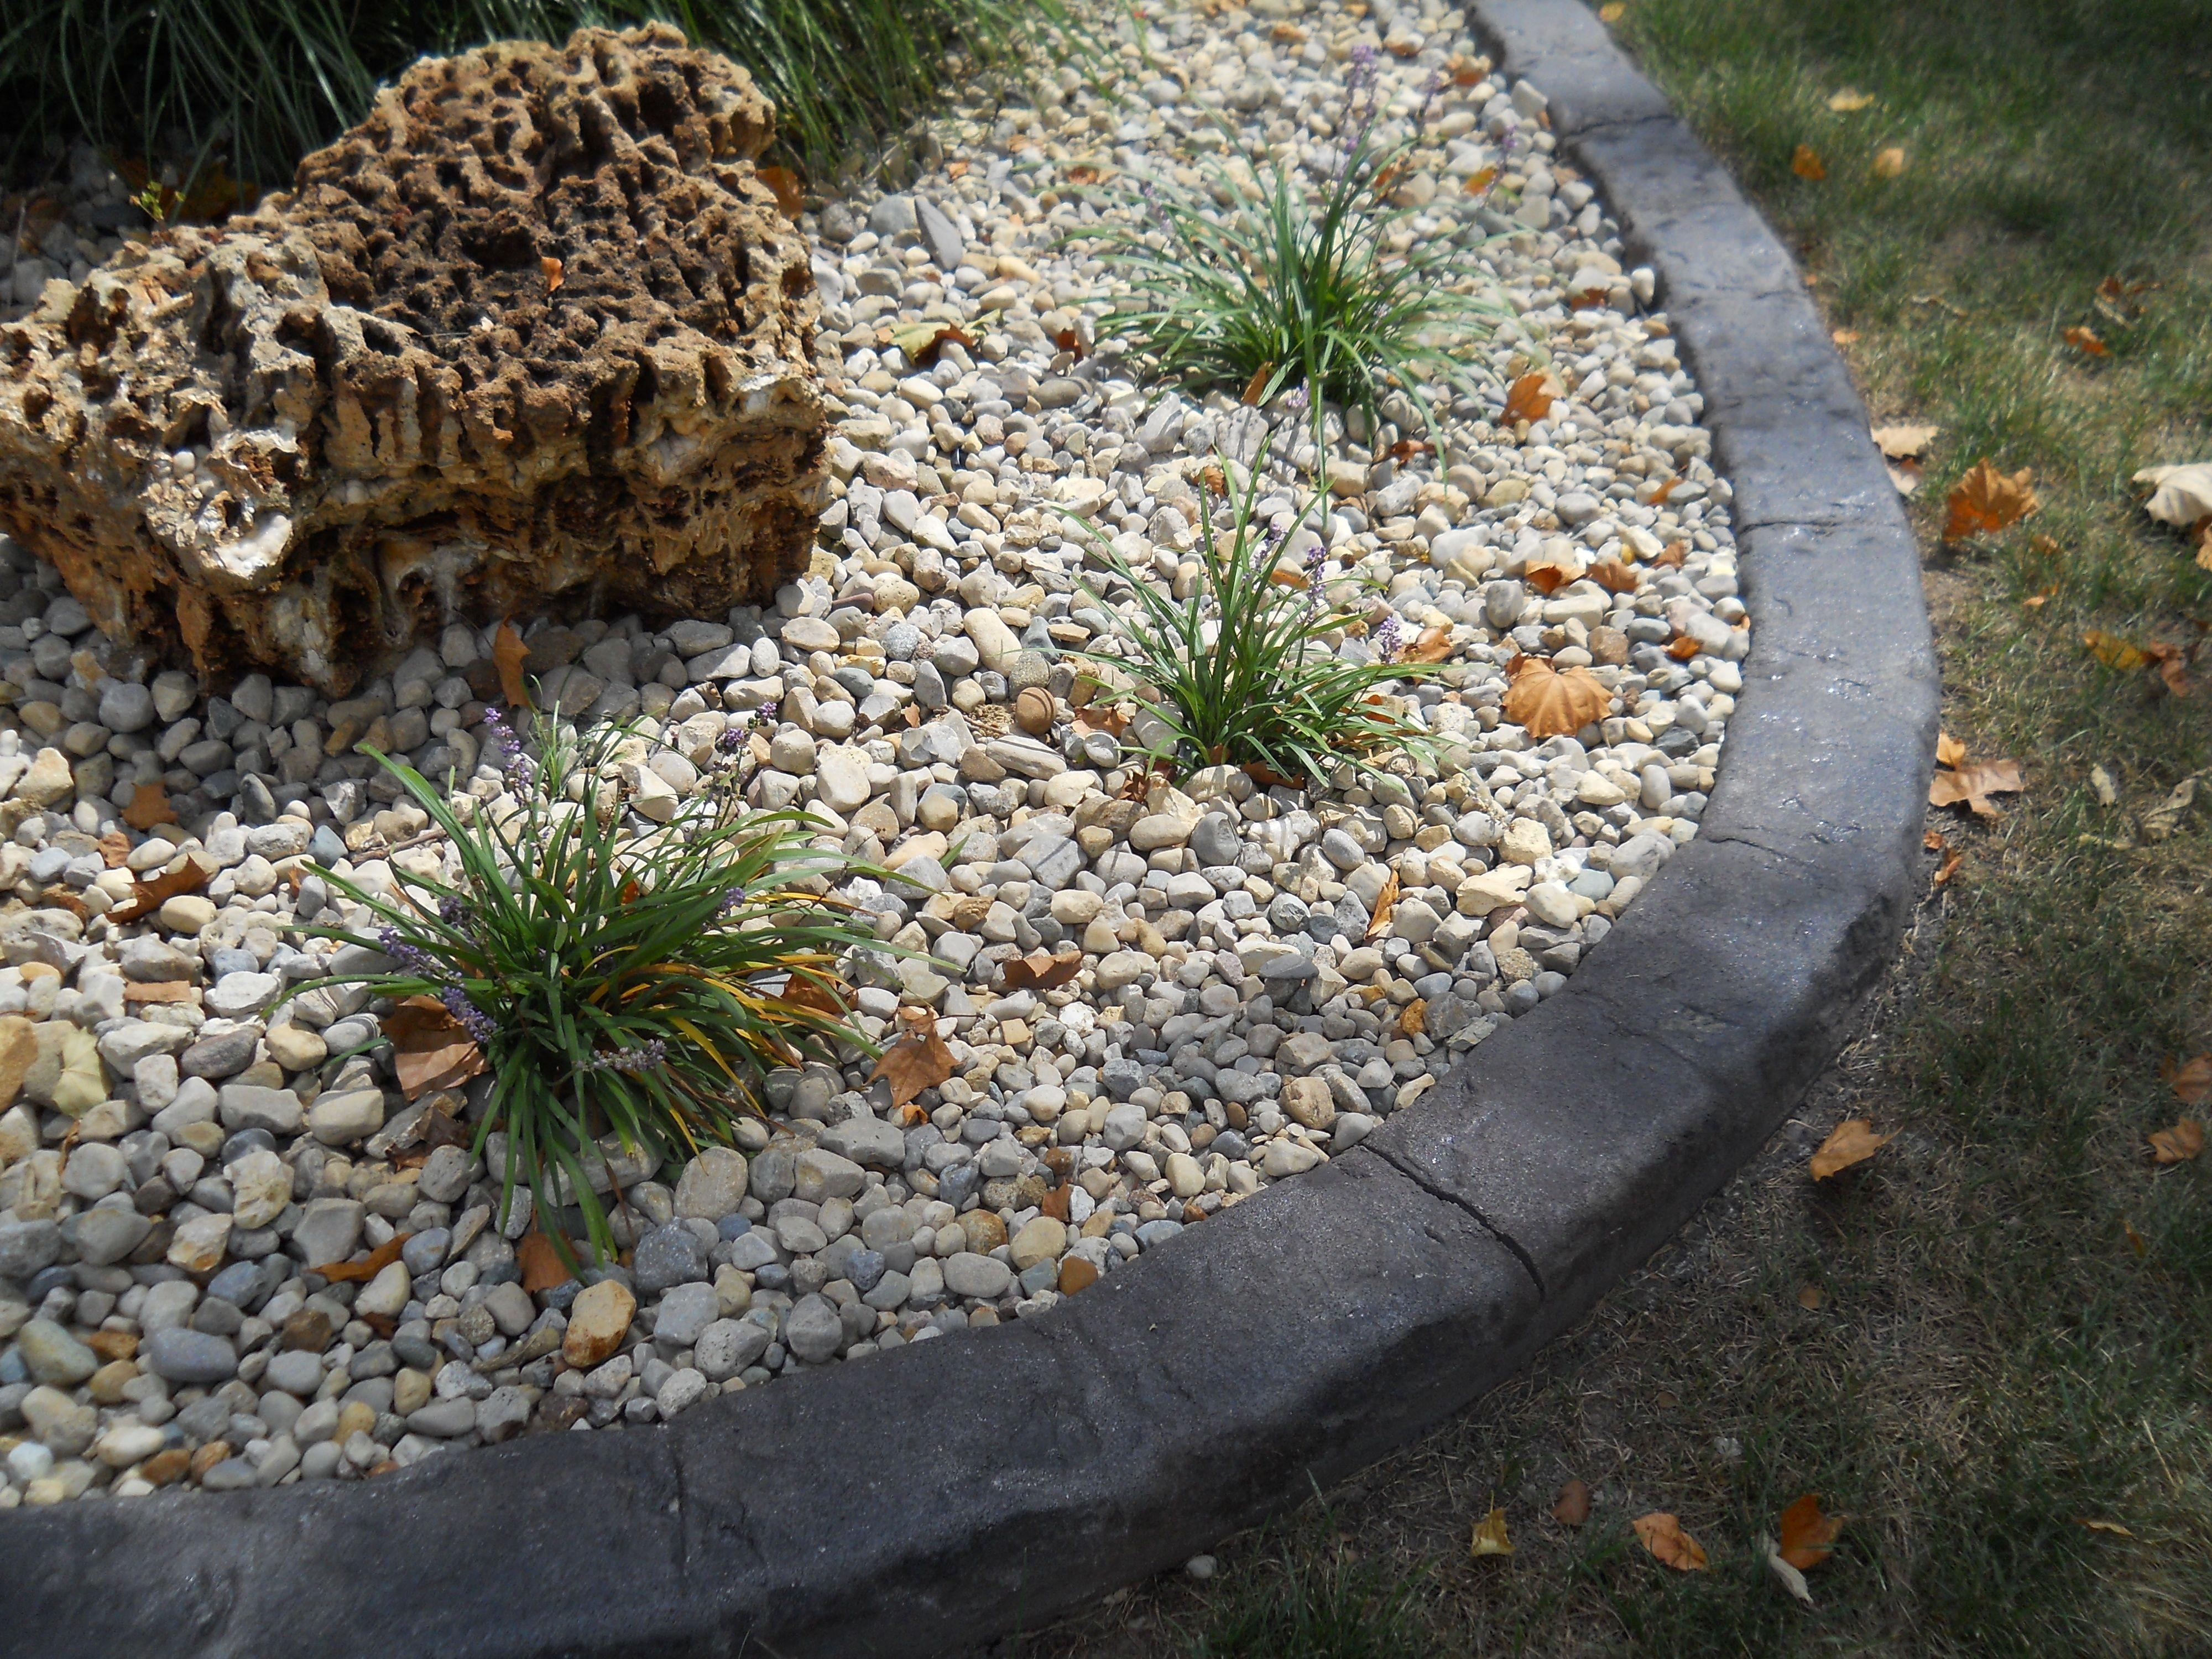 Diy Lawn Edging Ideas Beautiful Garden Edging Ideas Nz Contemporary Home Design Ideas